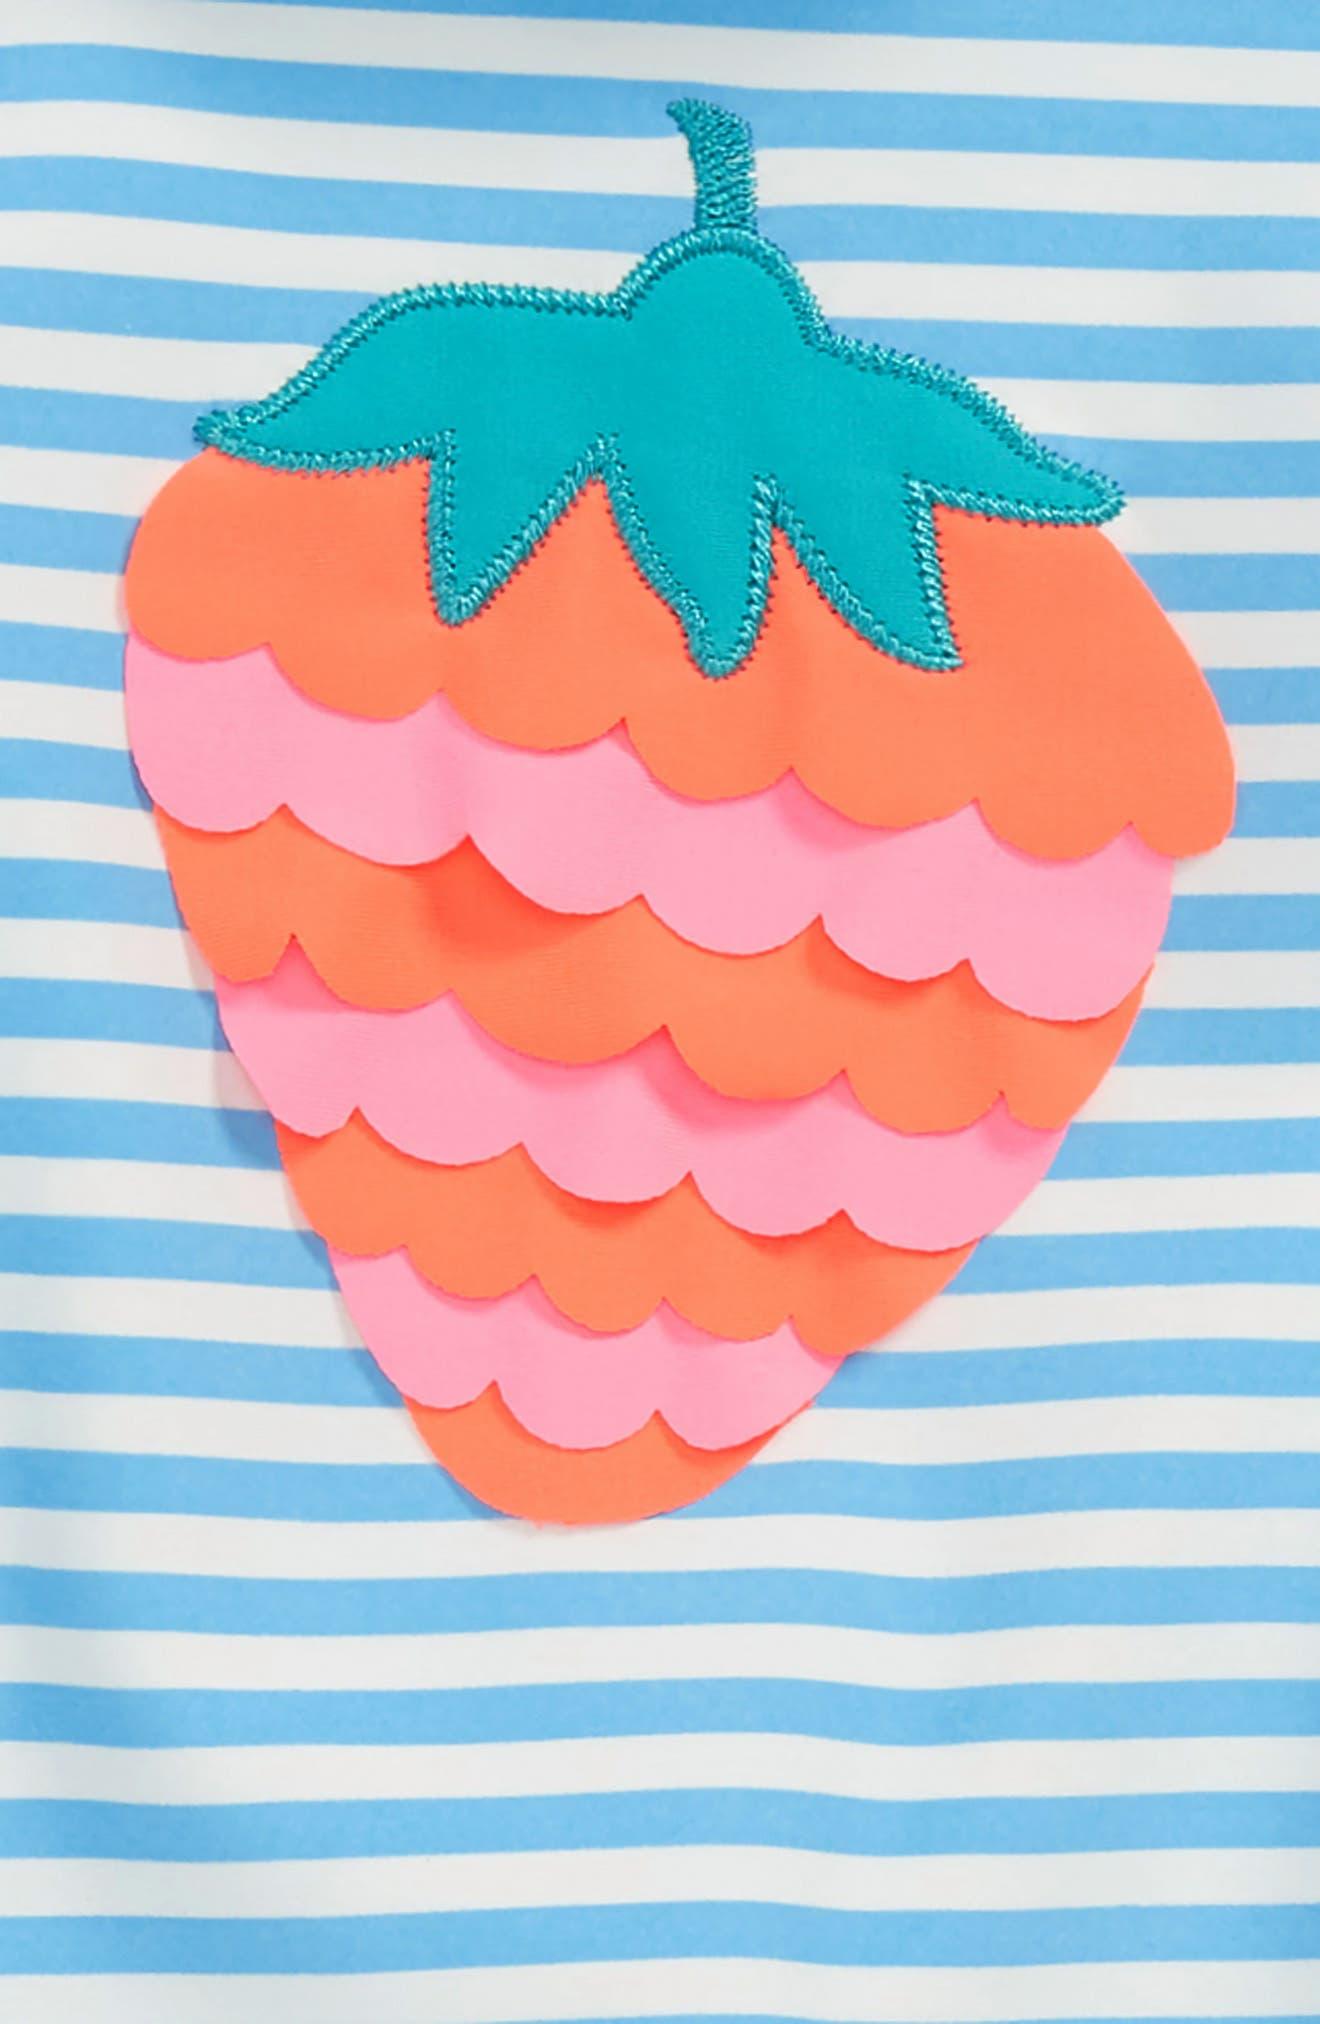 Two-Piece Rashguard Swimsuit,                             Alternate thumbnail 2, color,                             Candy Blue/ Ivory Stripe